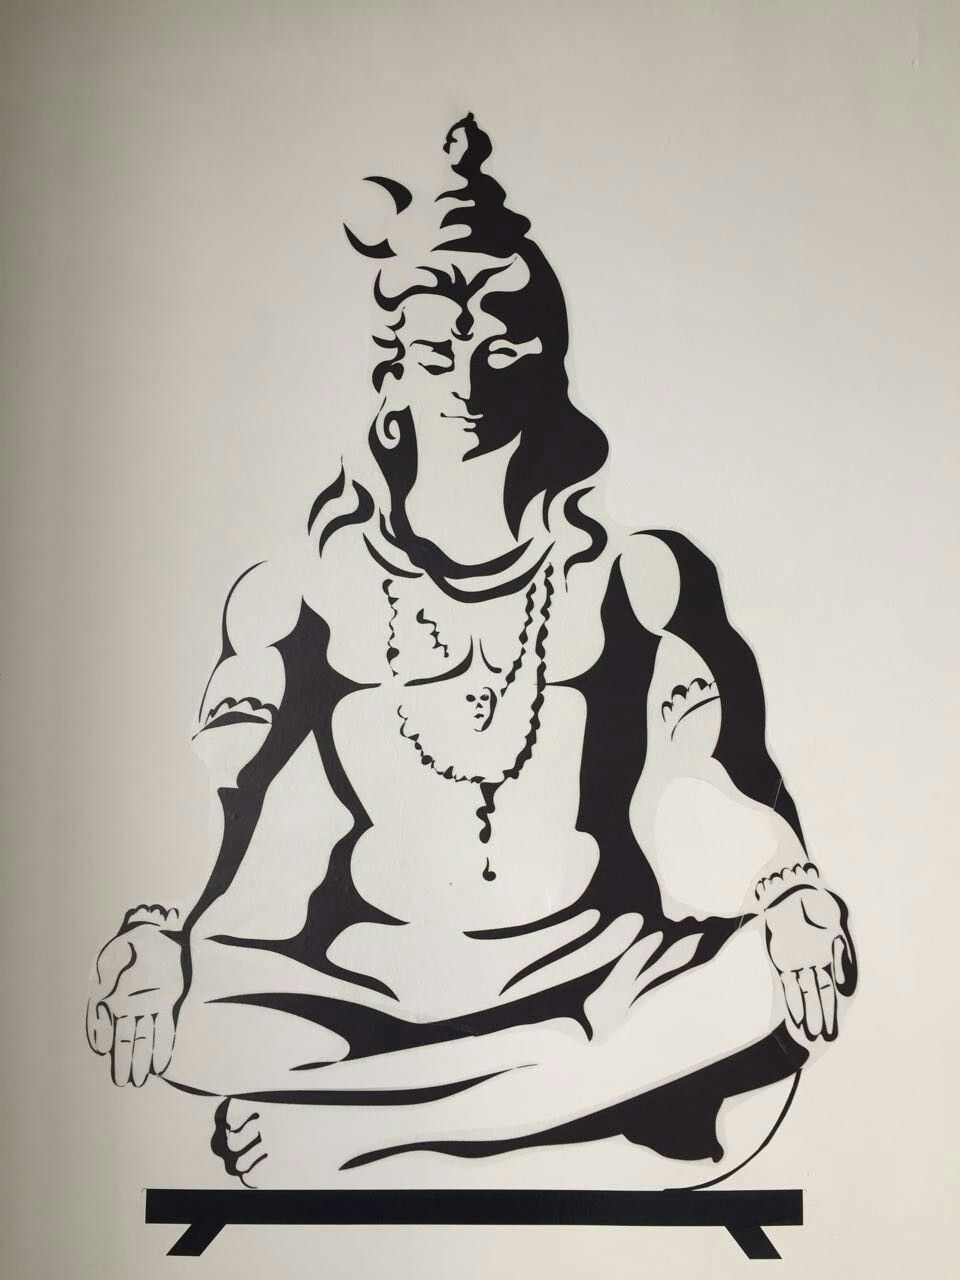 Pin By Renju Redzz On Shiva Shiva Art Lord Shiva Painting